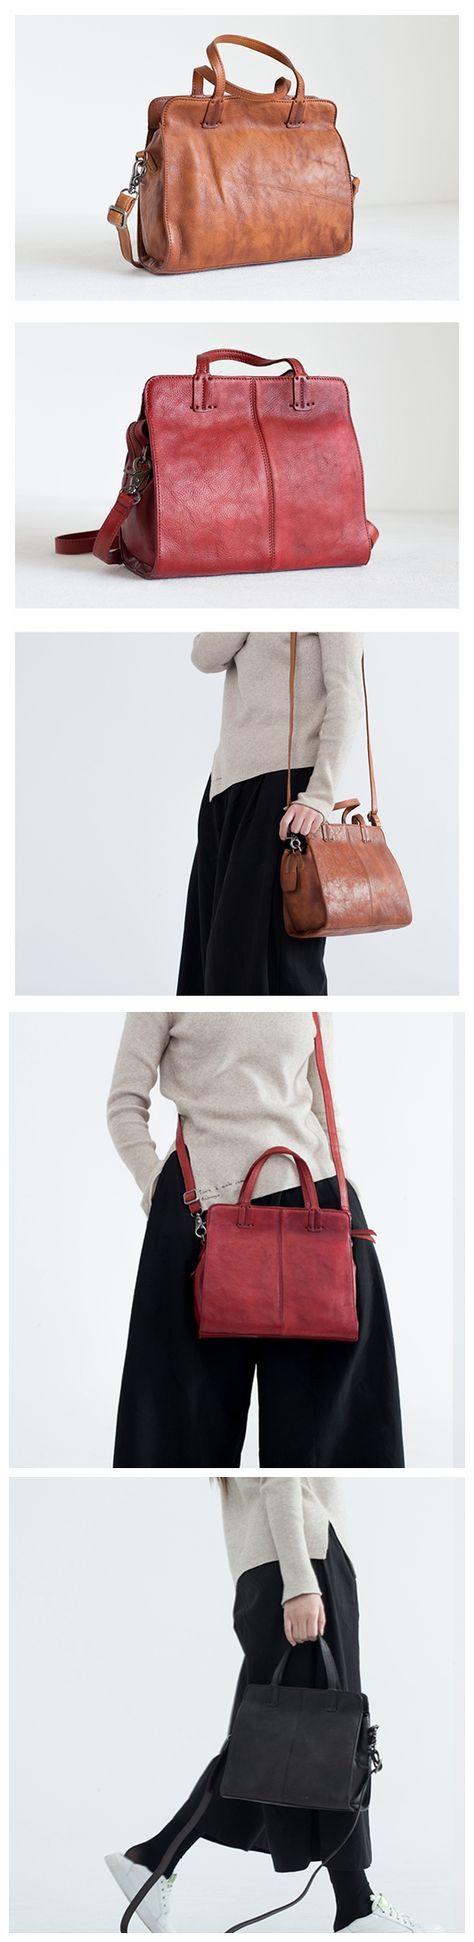 ed70b8a87c Handcrafted Full-Grain Leather Handbag Shoulder Bag Crossbody Bag Small  Satchel for Her SP02 -